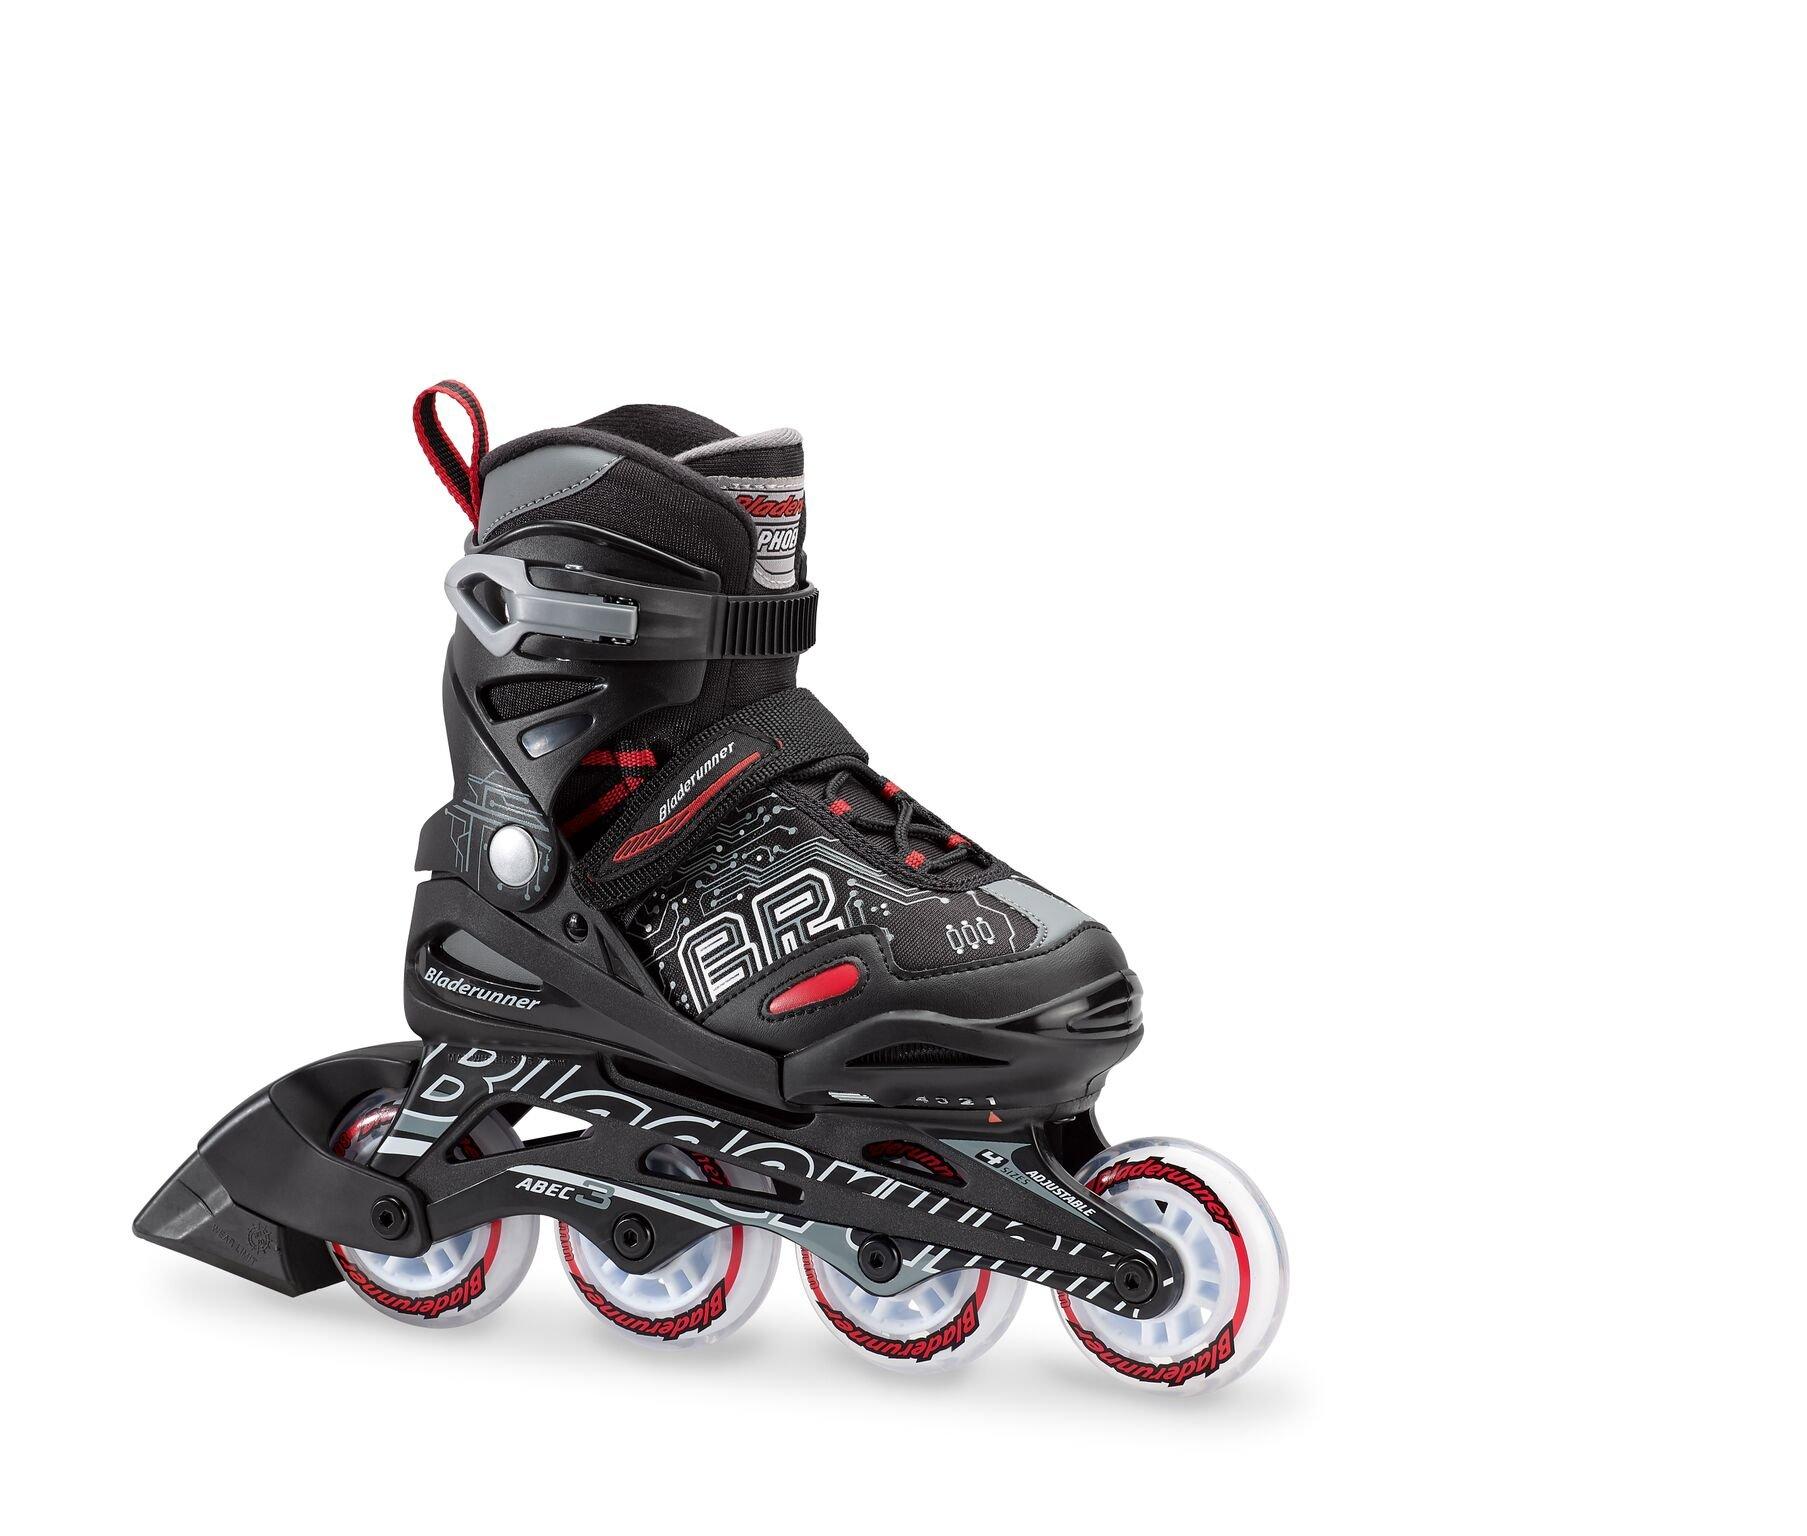 Bladerunner by Rollerblade Phoenix Boys Adjustable Fitness Inline Skate, Black and Red, Junior, Value Performance Inline Skates by Rollerblade